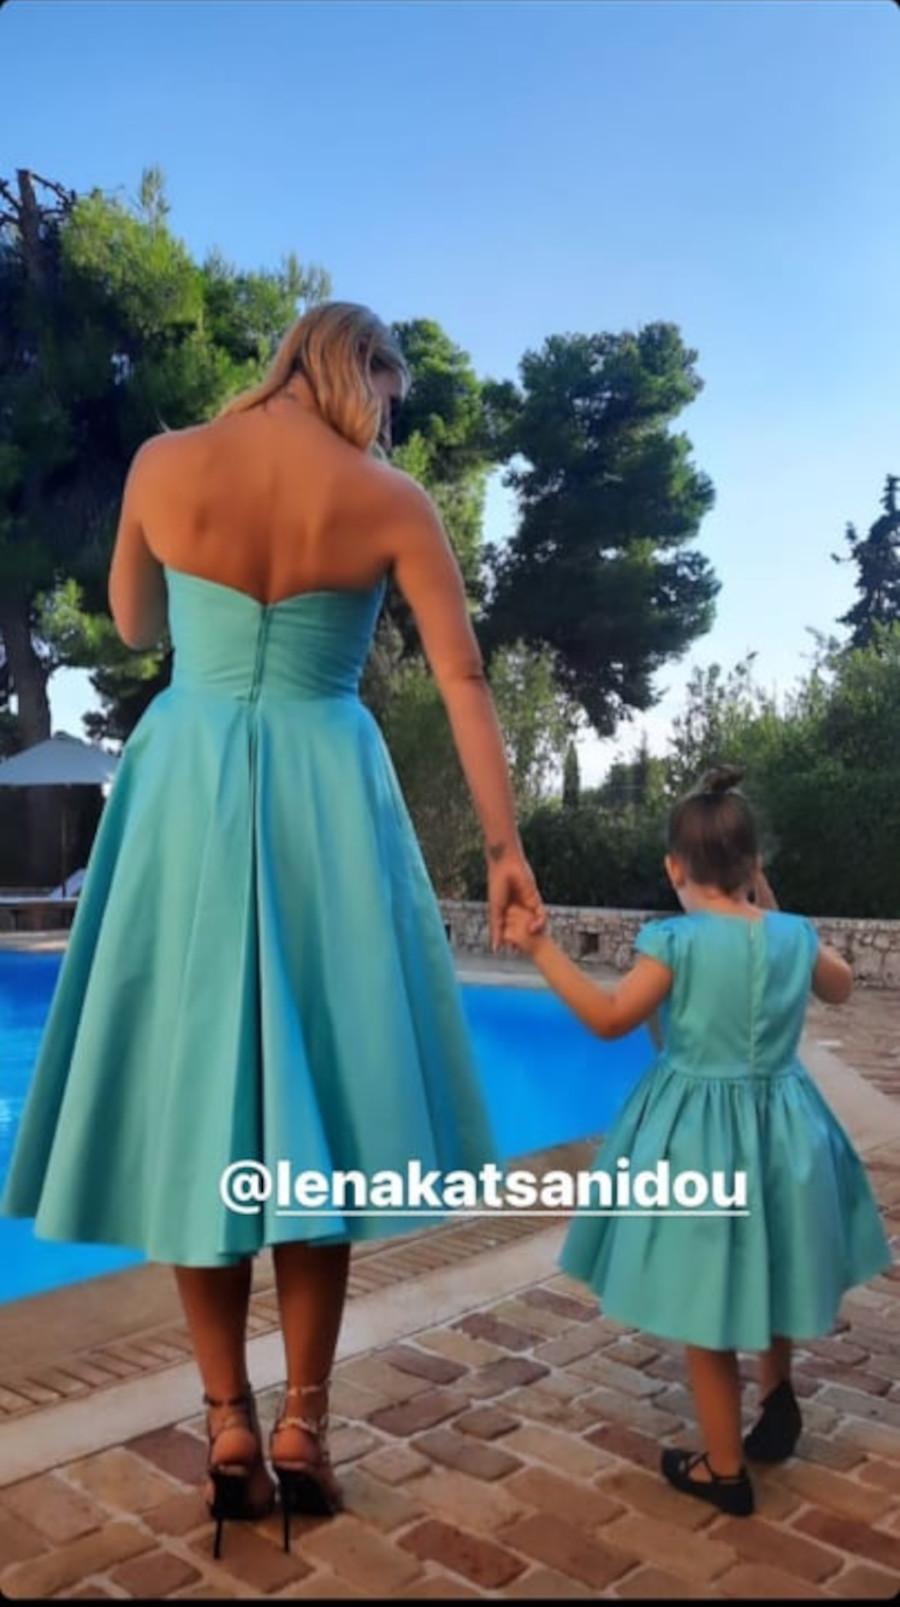 H Ελεονώρα Μελέτη φόρεσε το ίδιο φόρεμα με την τρίχρονη κόρη της, Αλεξάνδρα